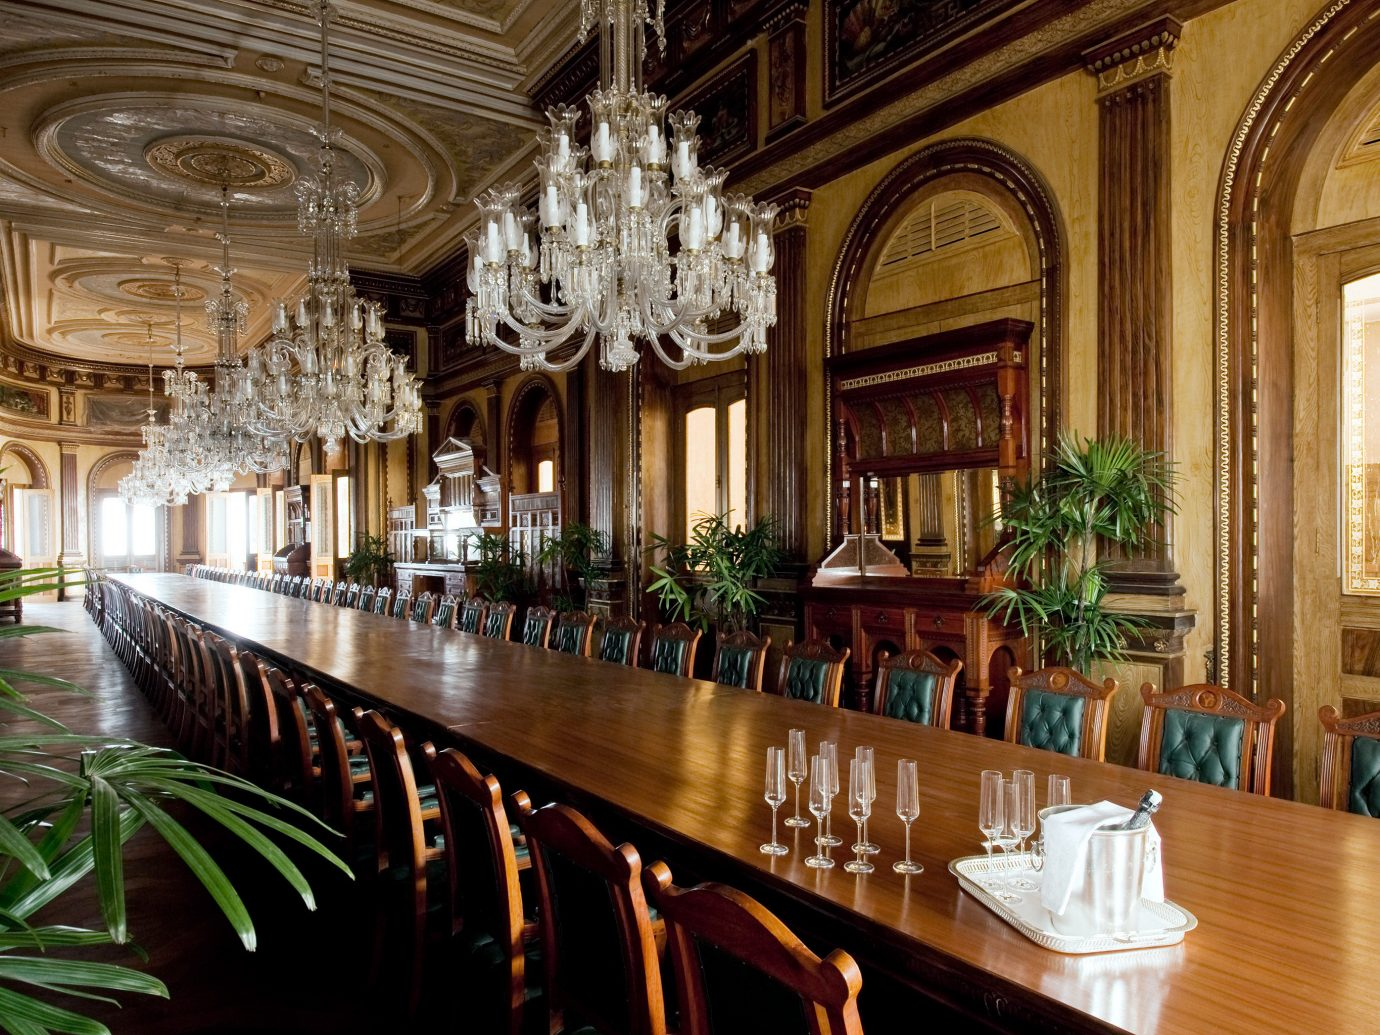 Design Dining Drink Eat Elegant Luxury Travel Tips indoor estate building Lobby palace mansion interior design function hall ballroom restaurant furniture several dining room